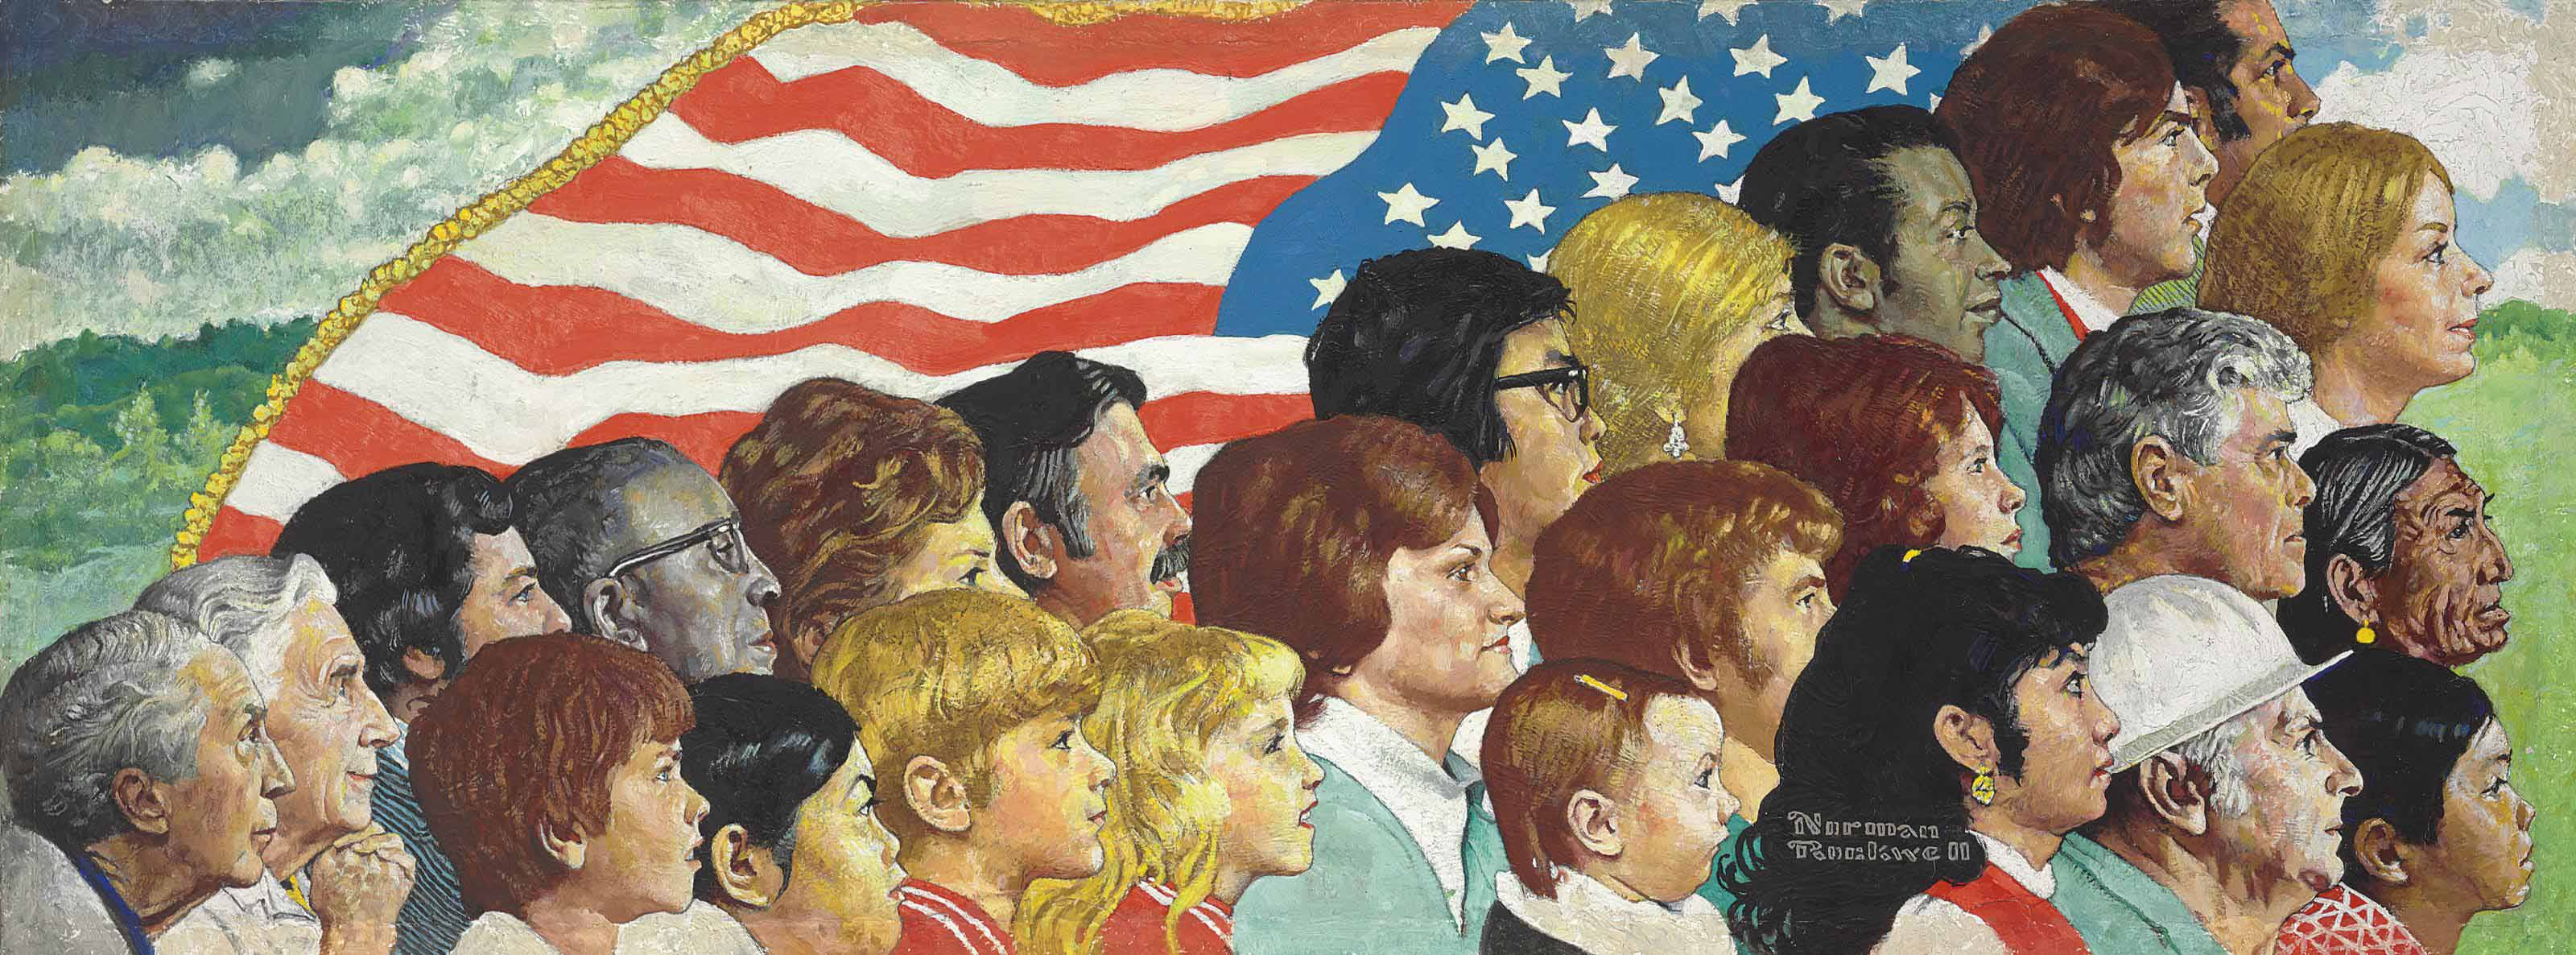 rockwell-america